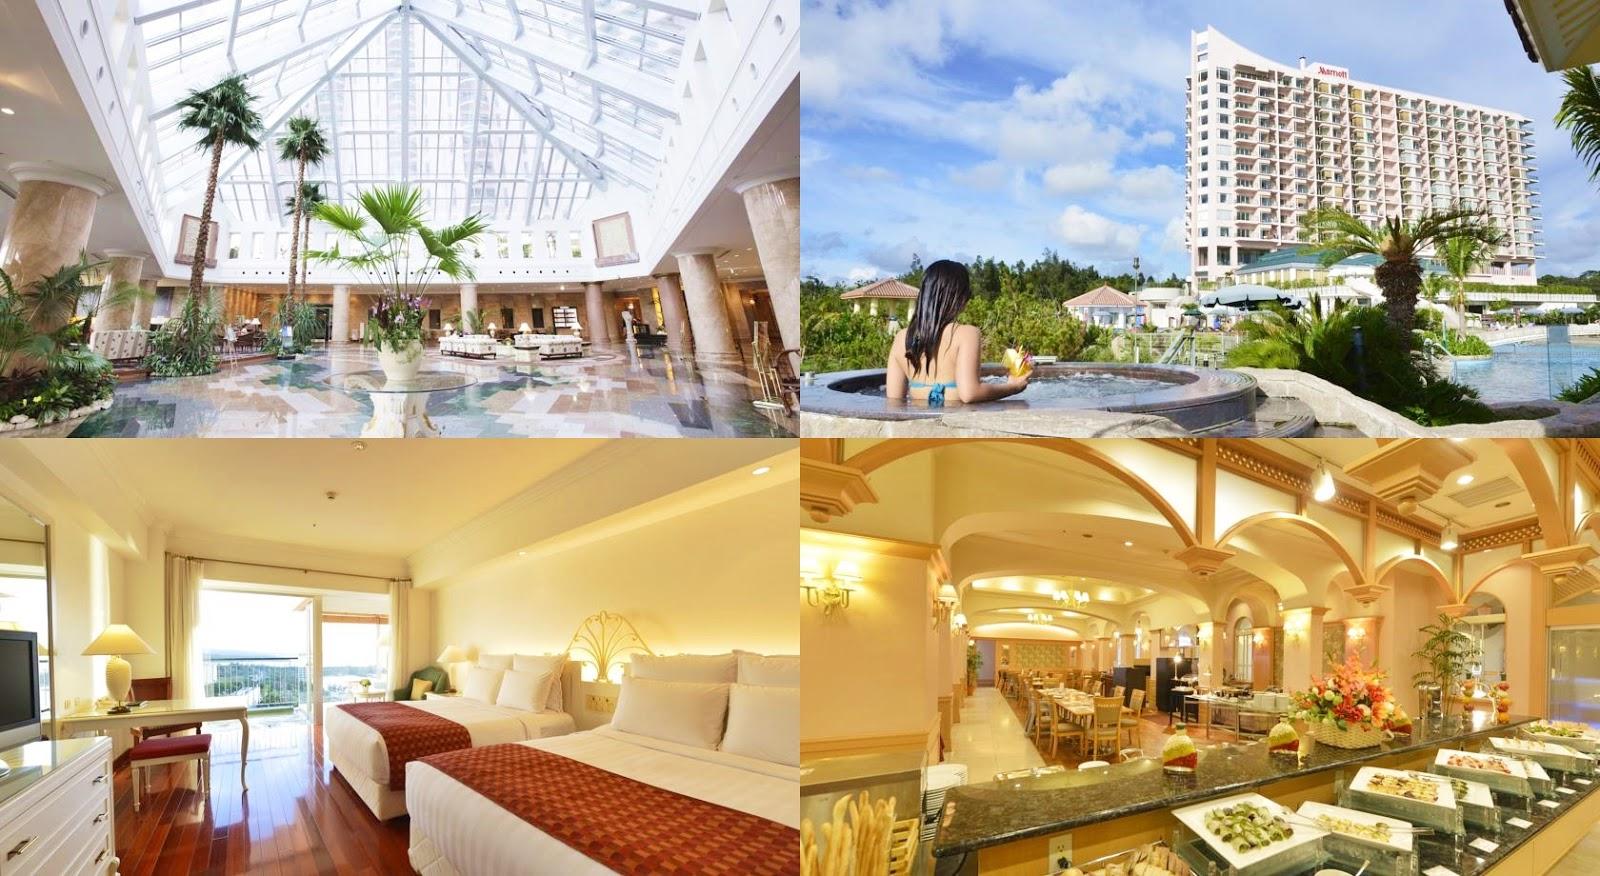 沖繩-住宿-推薦-沖繩萬豪度假酒店-Okinawa-Marriott-Resort&Spa-Okinawa-hotel-recommendation